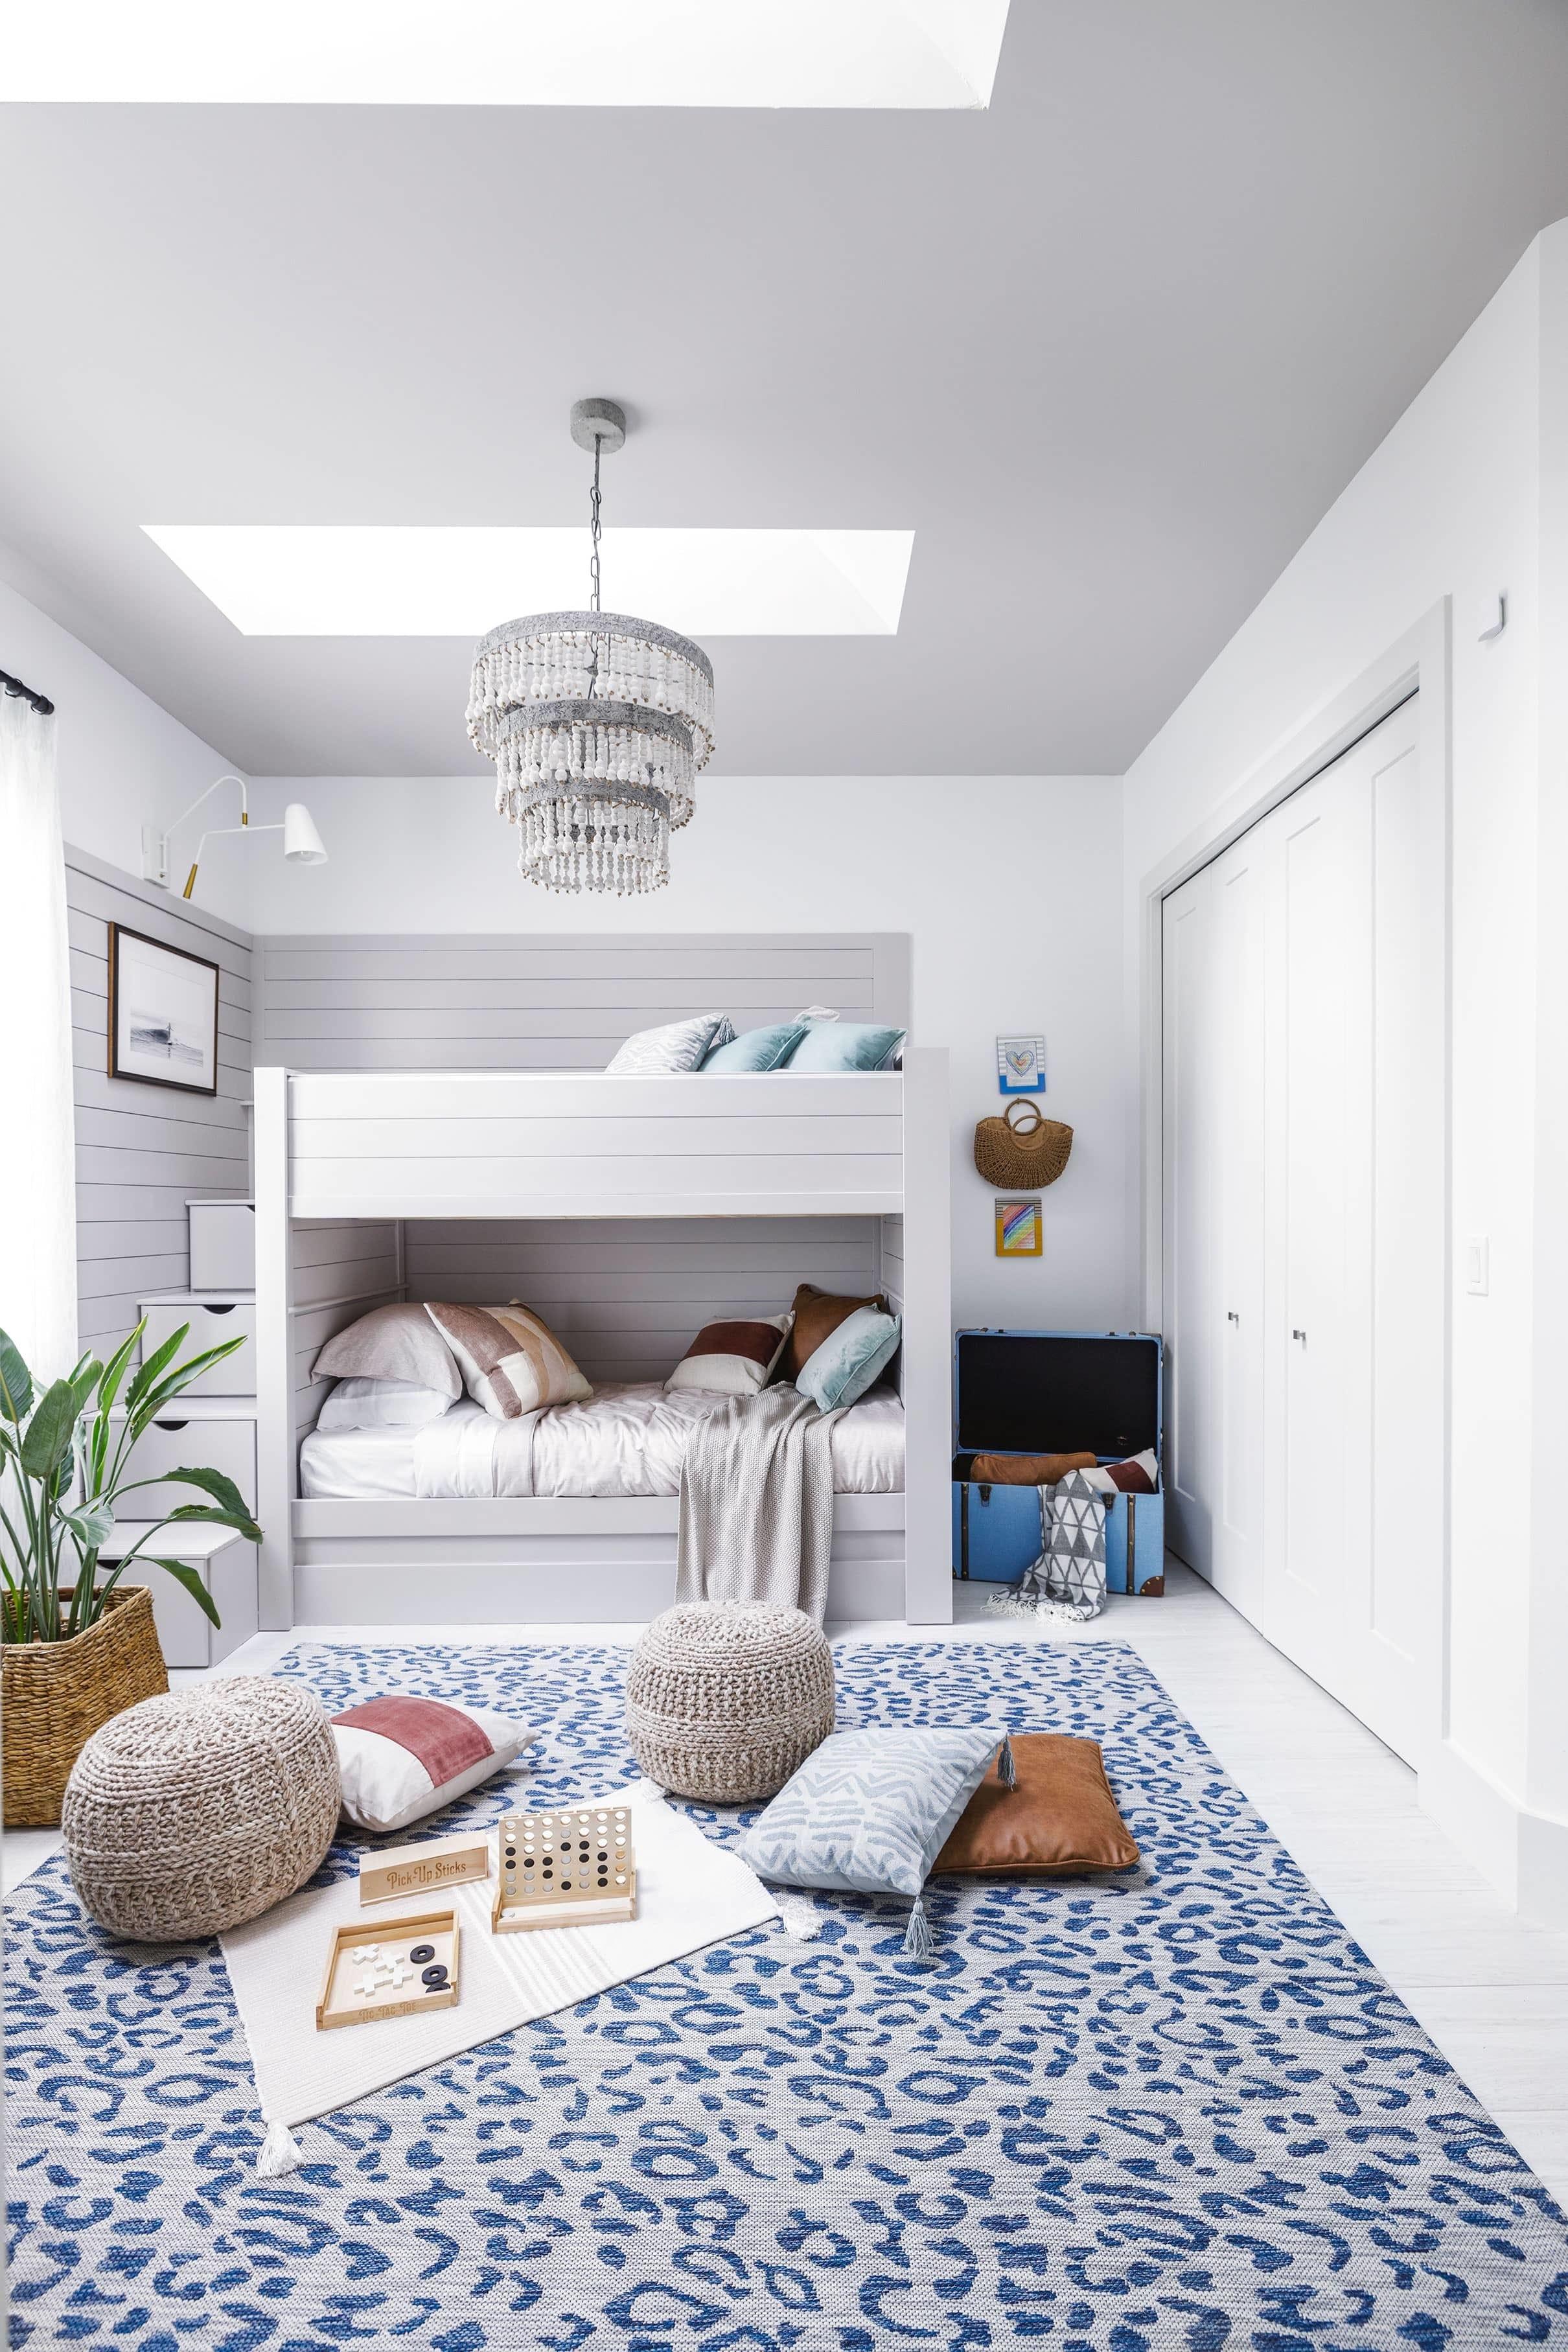 Bedroom bunk beds skylights blue white grey